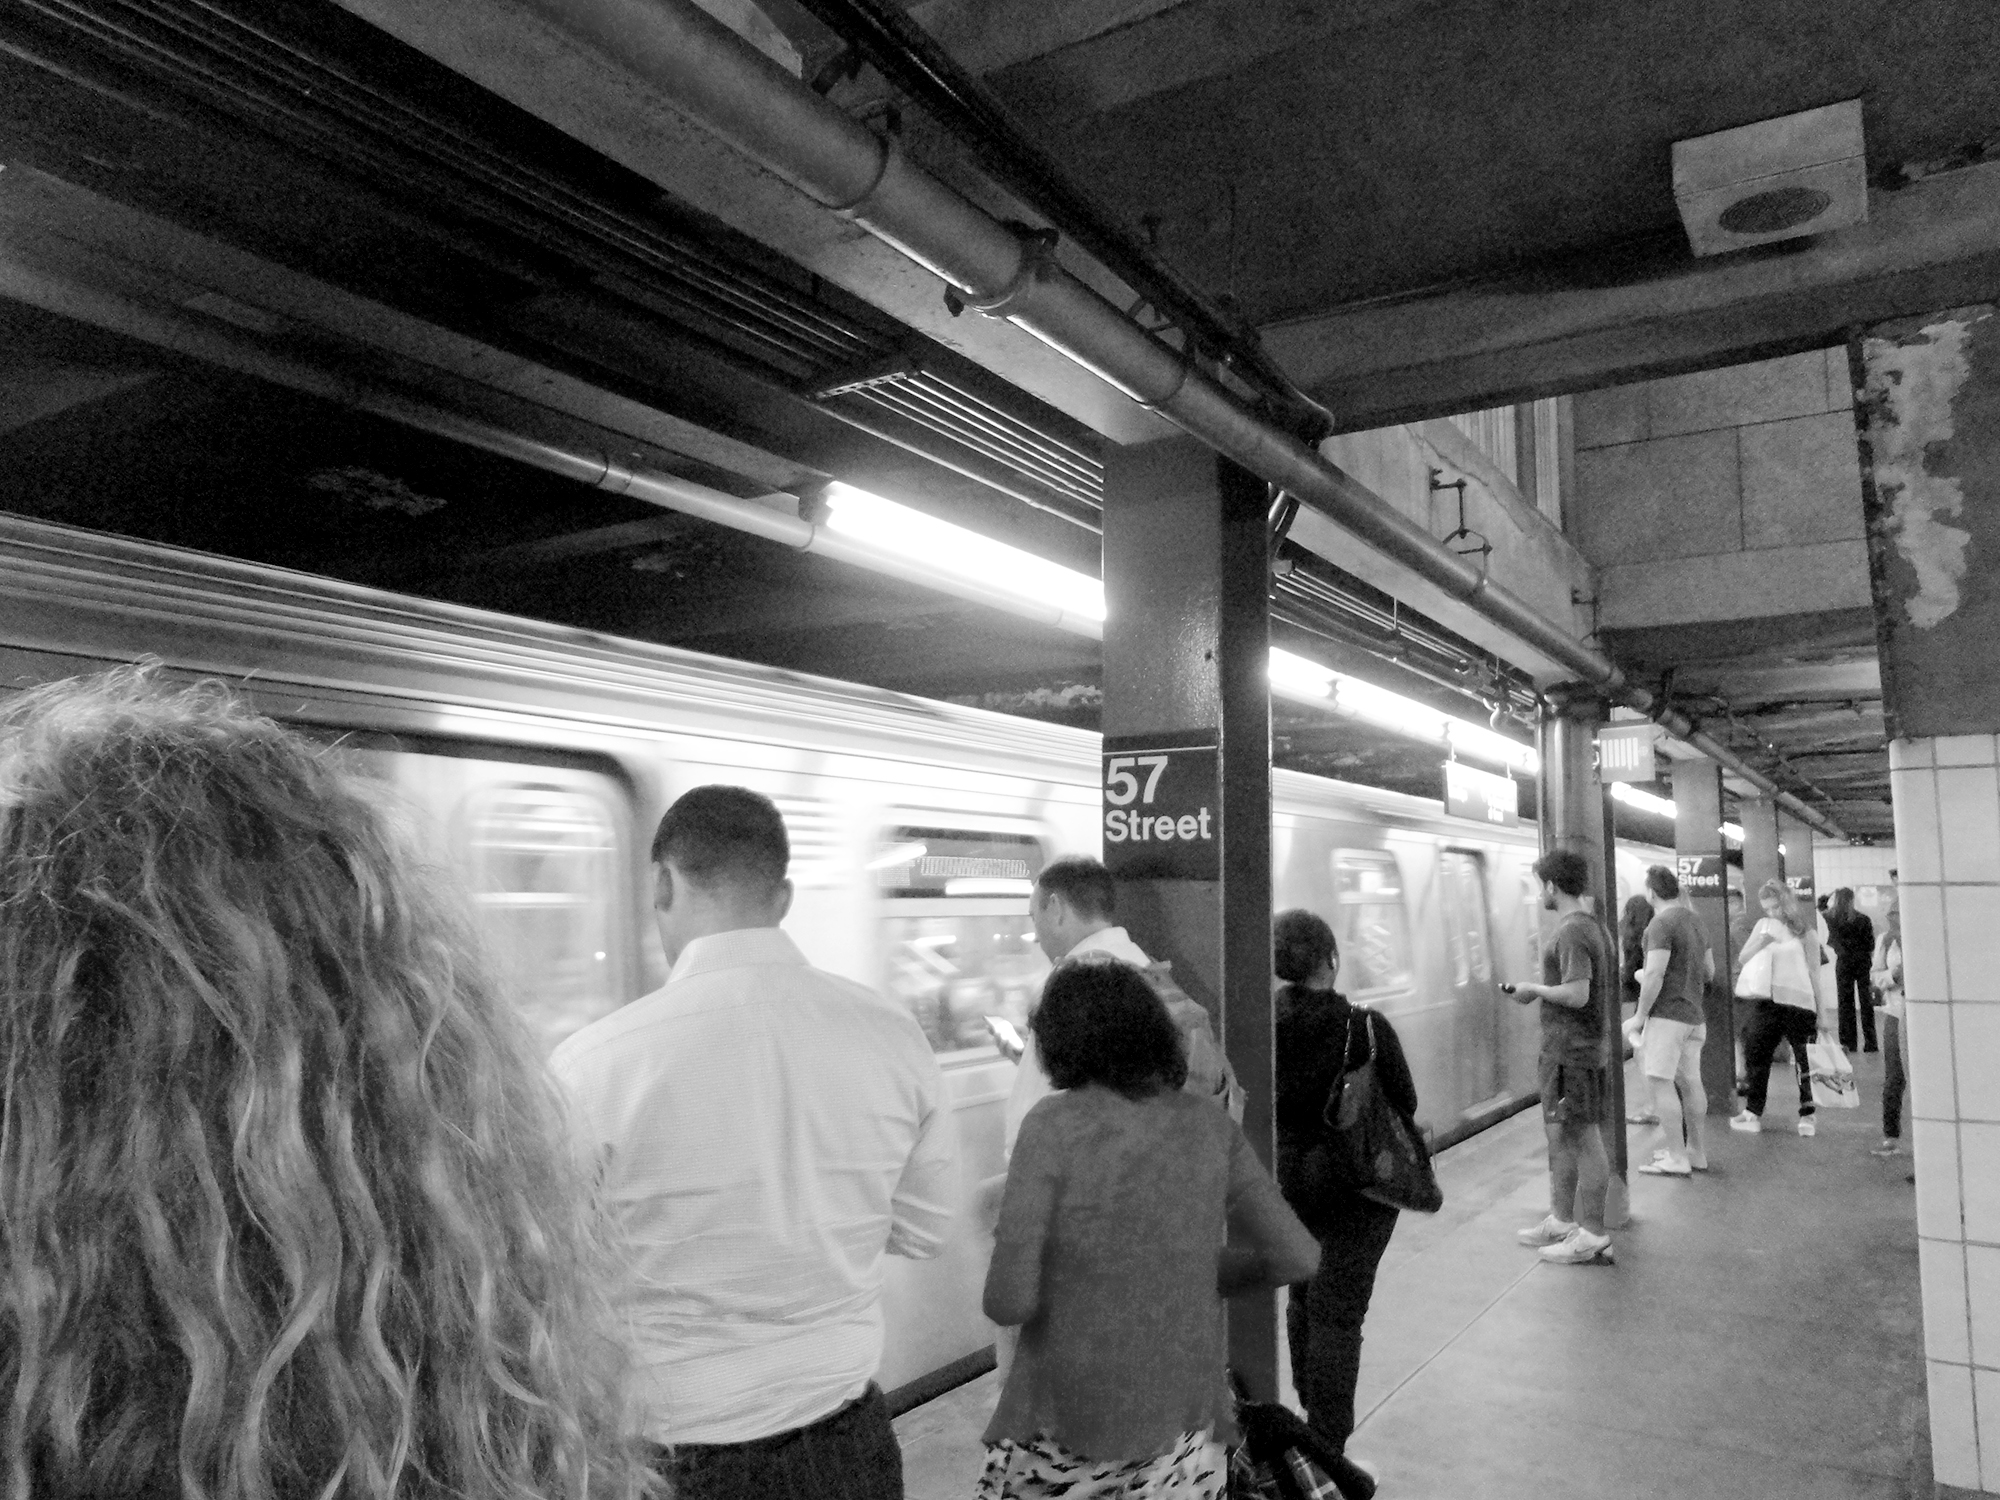 57th-street-subway